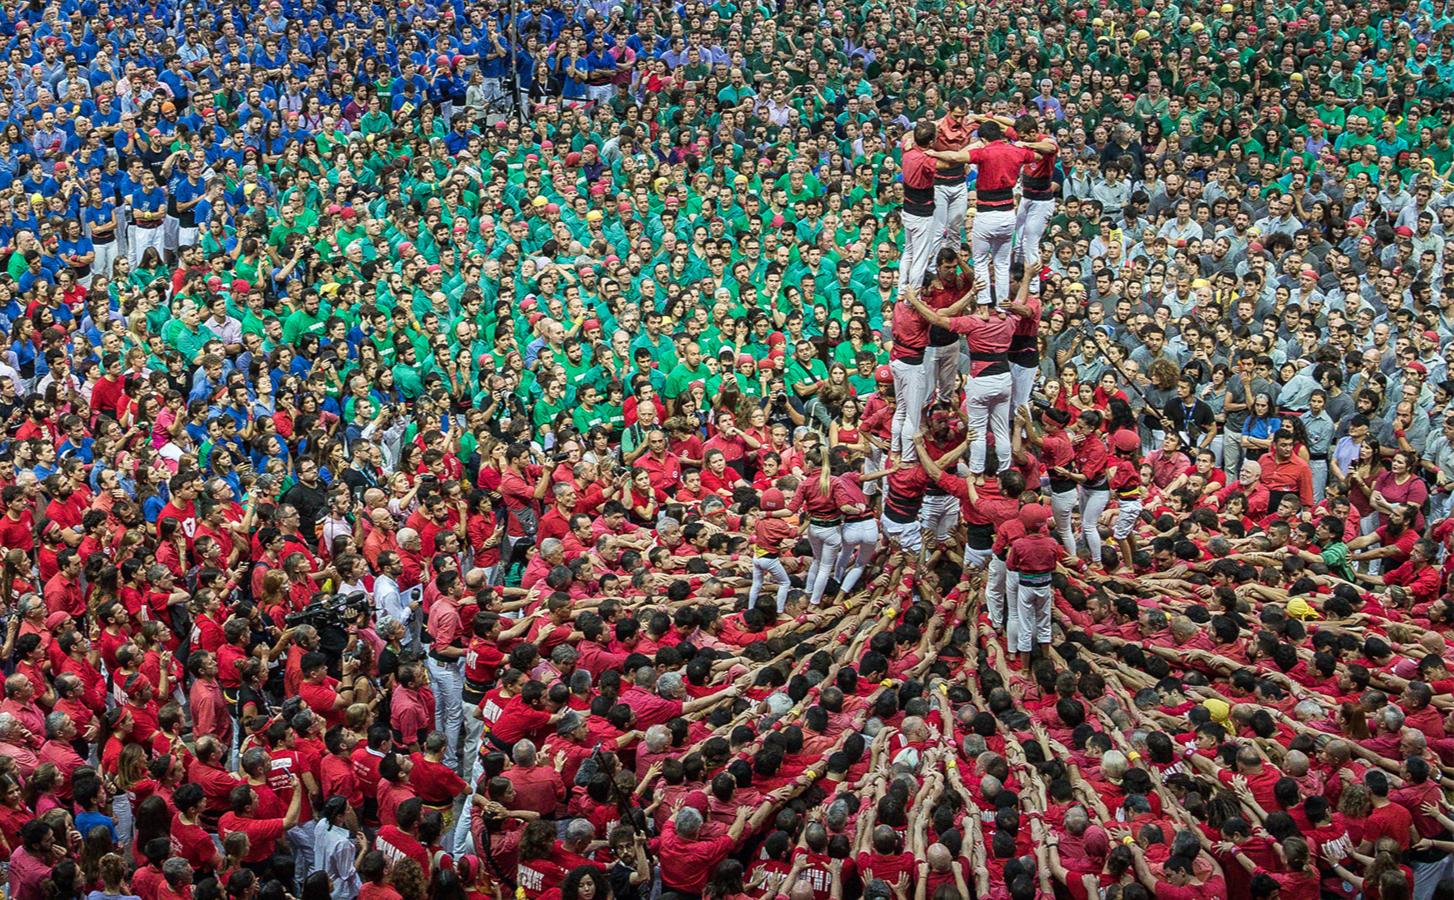 Фото: Maja Hitij / Getty Images